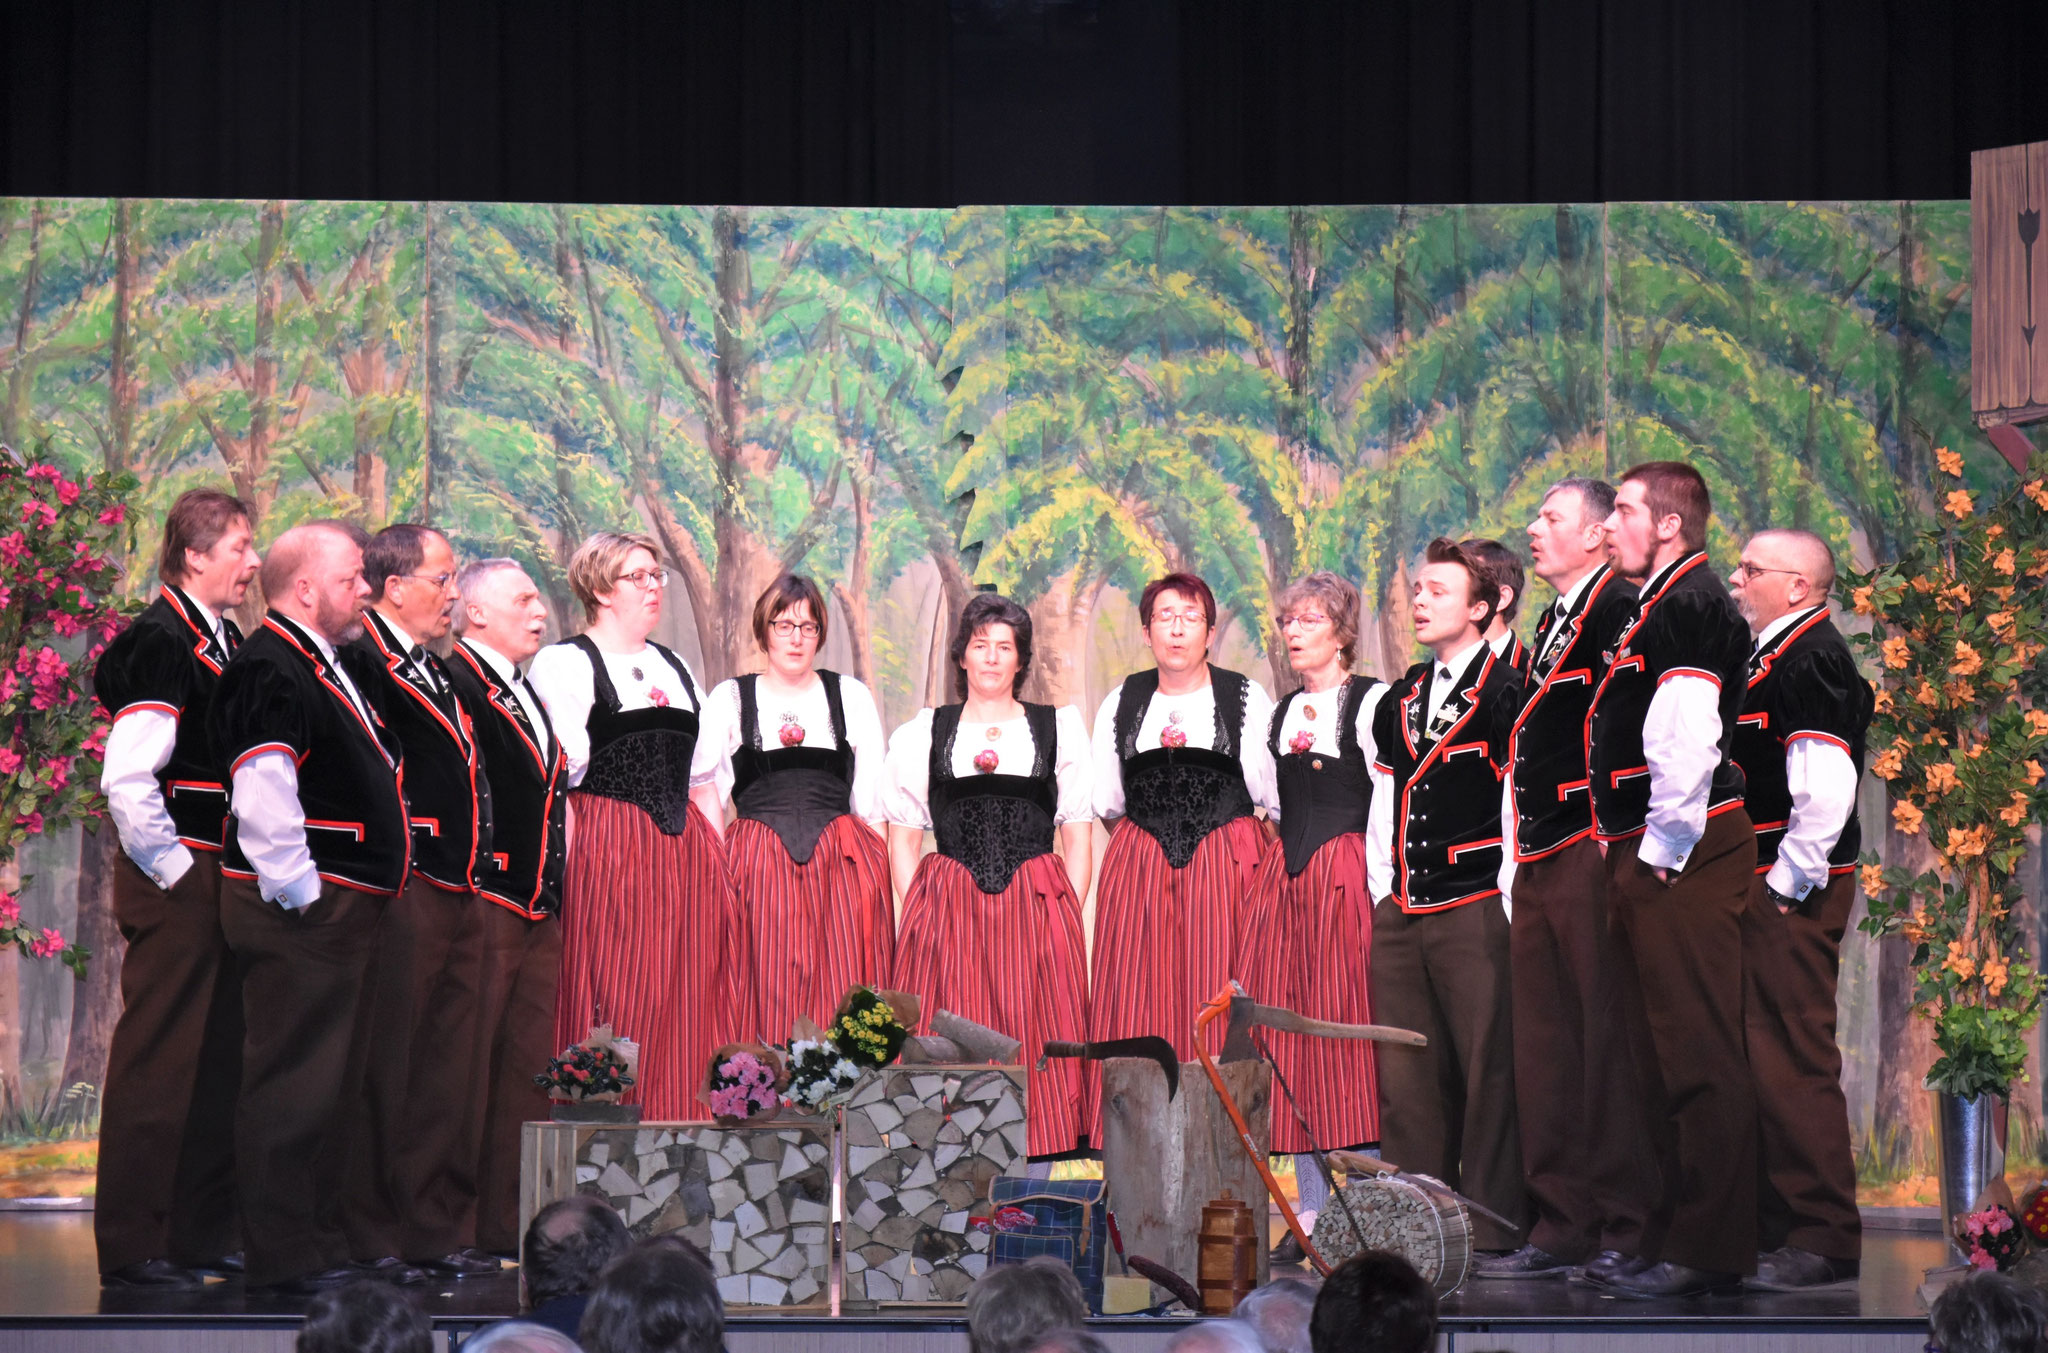 Jodlerchörli Gysaufluh Burgdorf